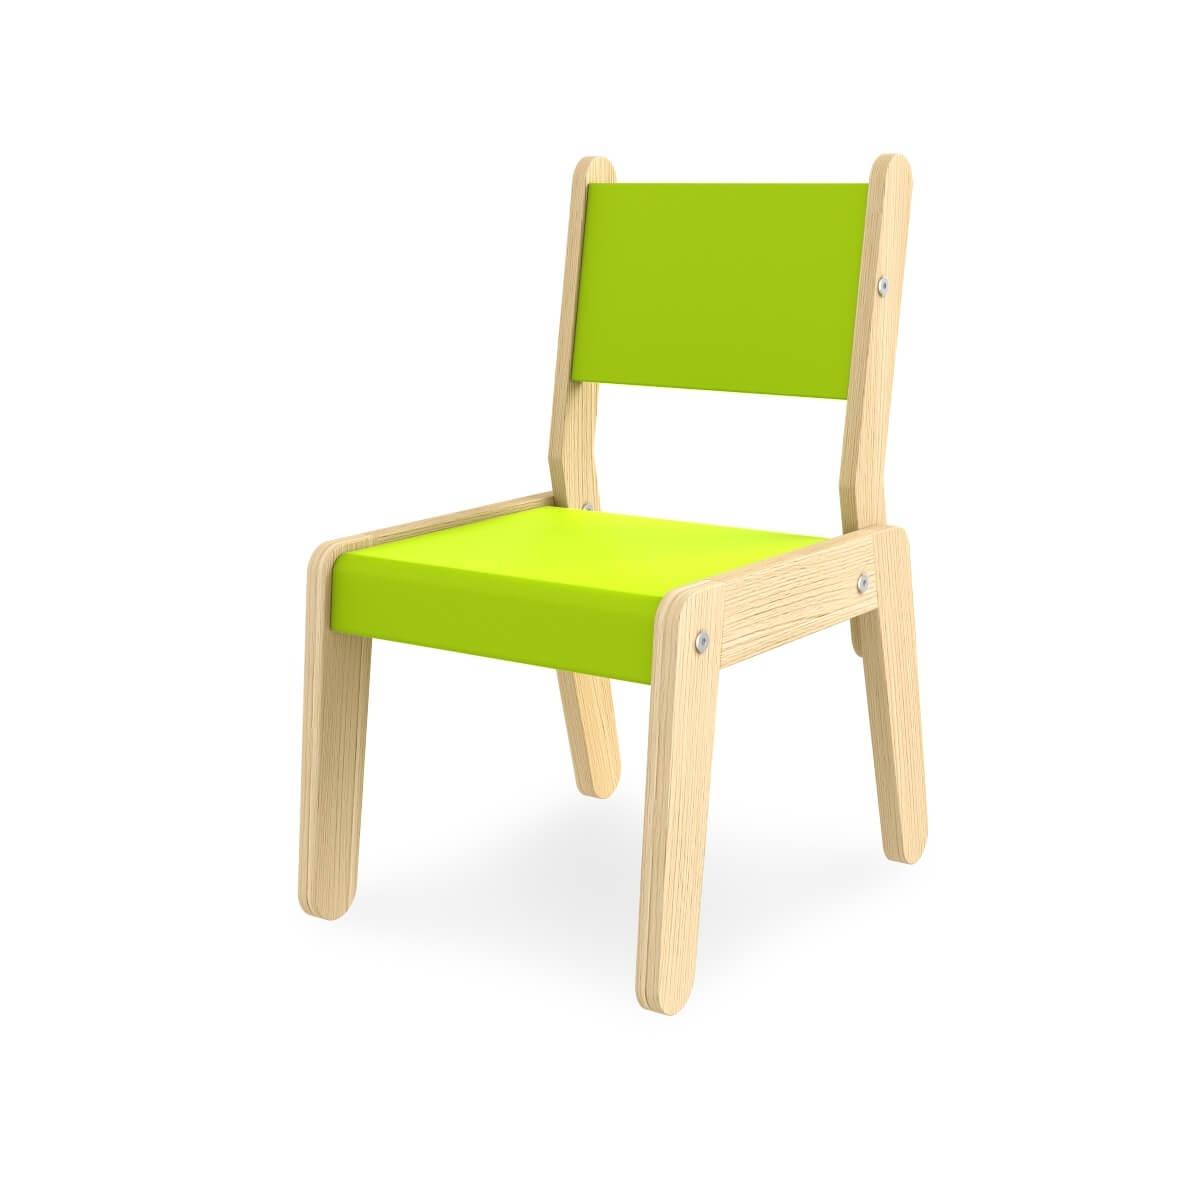 Scaun pentru copii din MDF Simple Green / Oak l45xA33xH61 cm